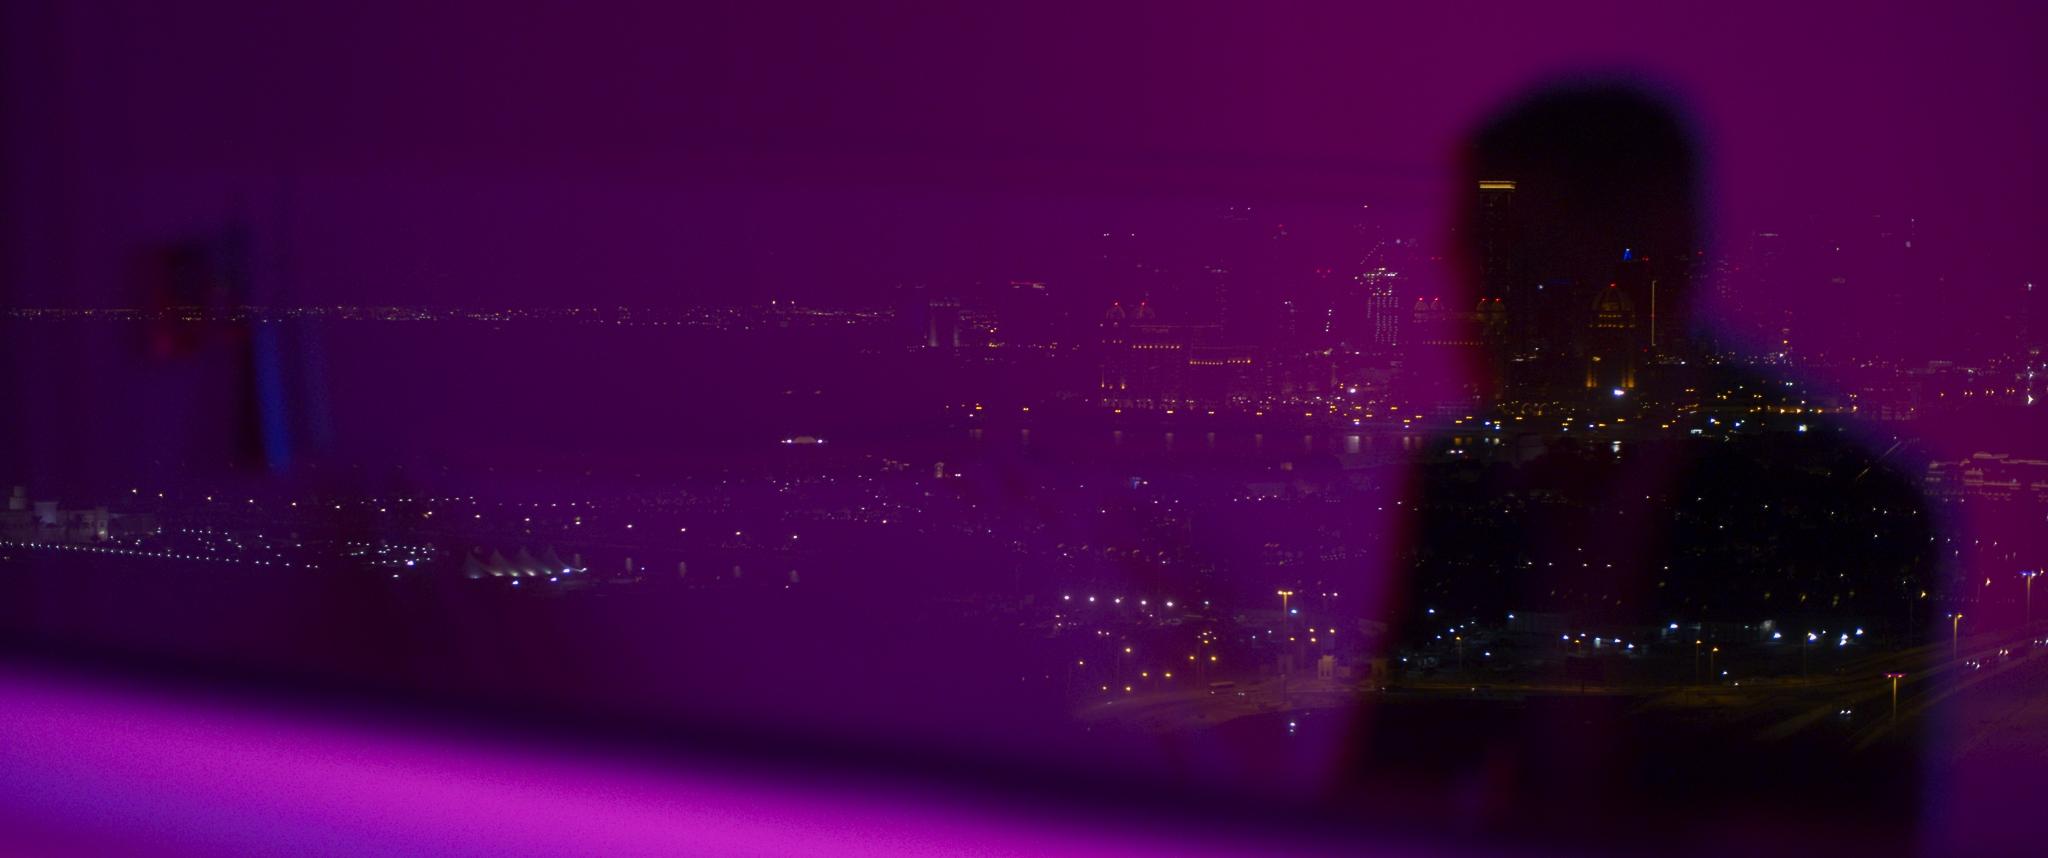 MondrianHotel_Film_1.73.1